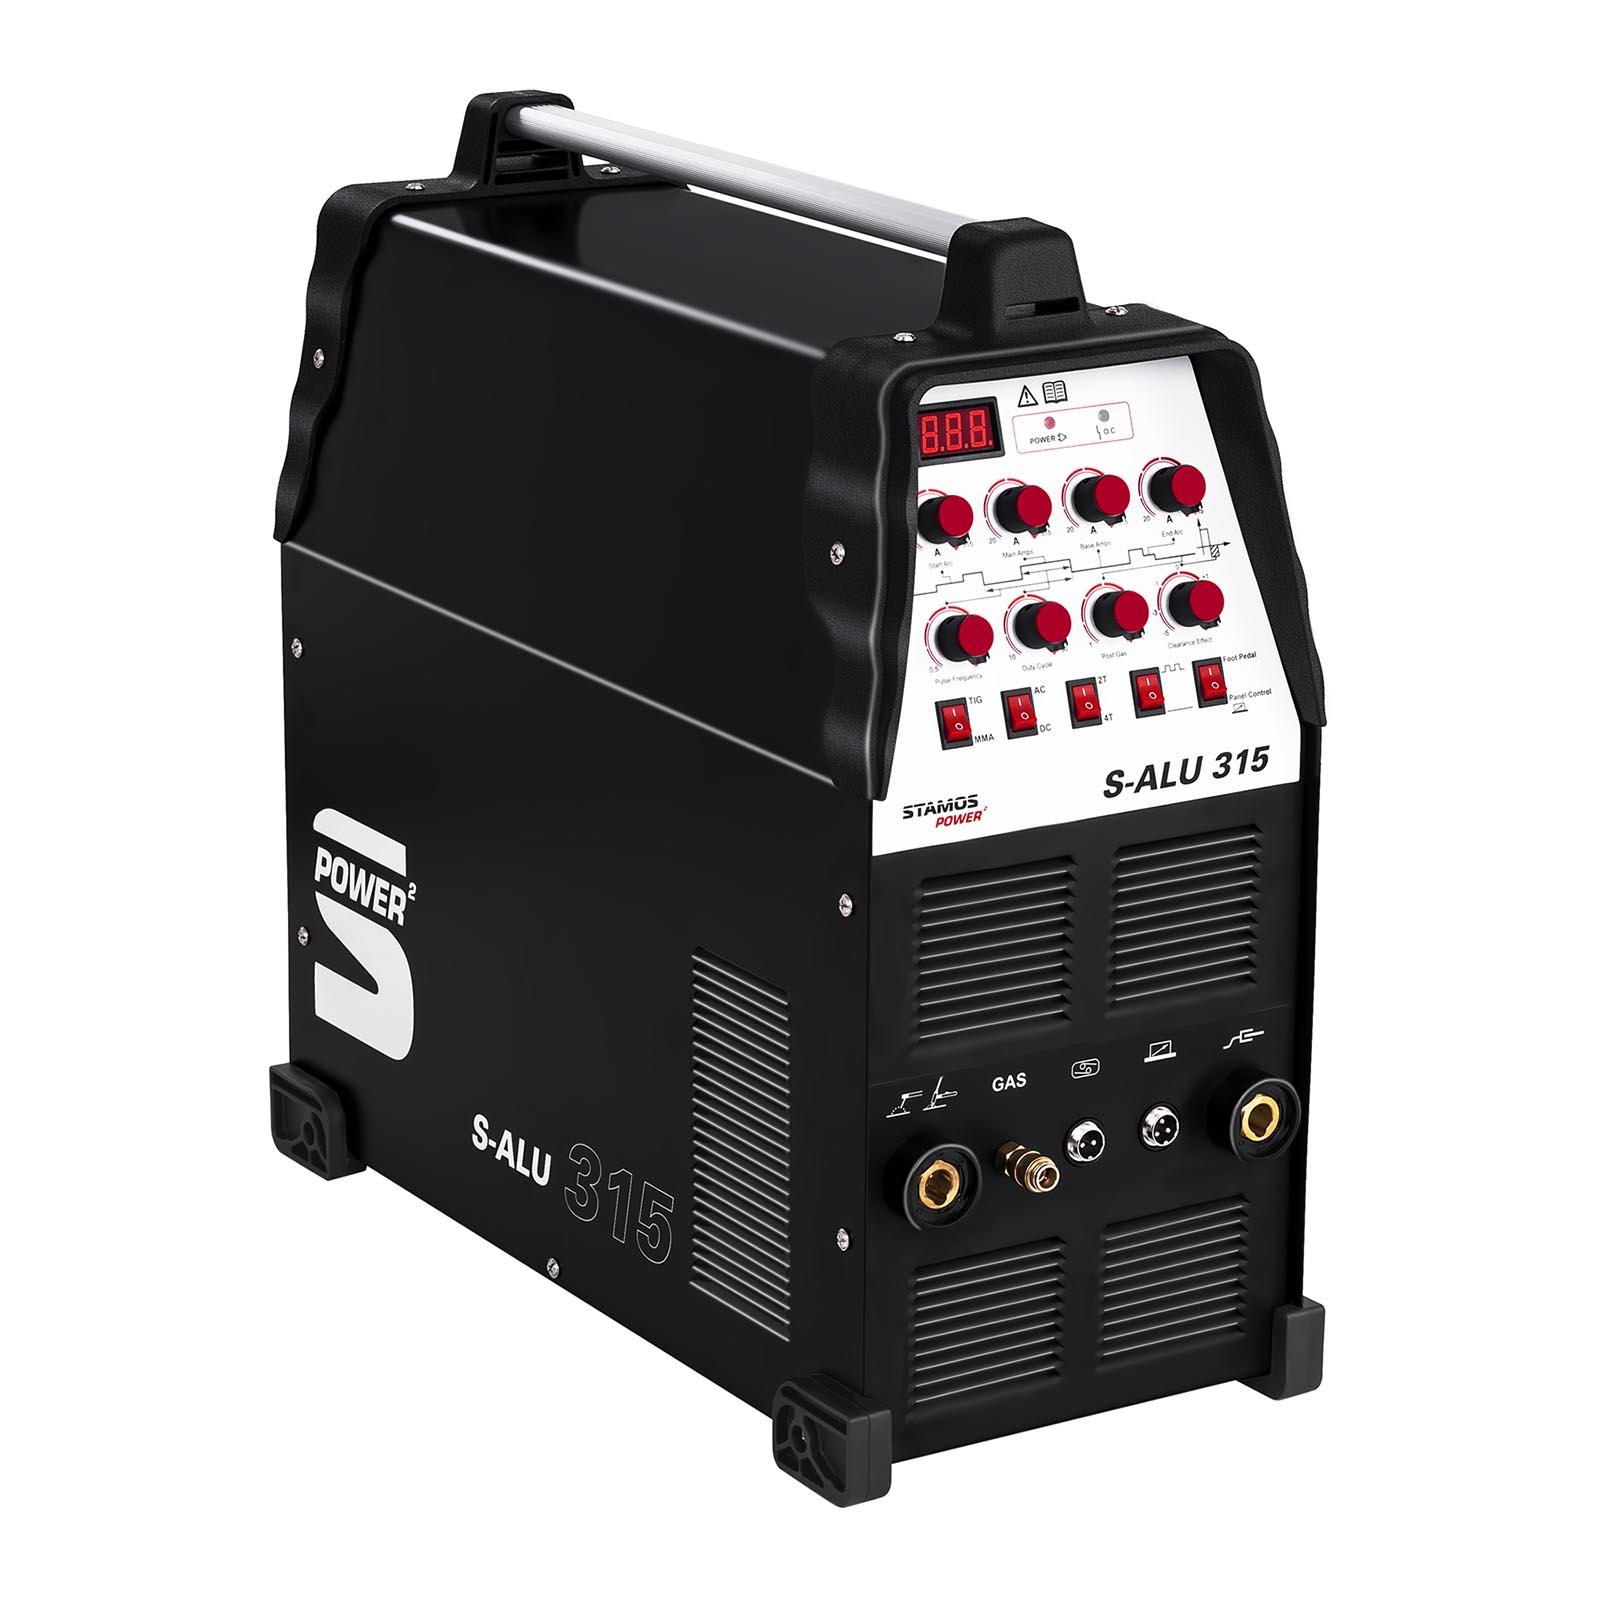 Stamos Power ² ALU Schweißgerät - 315 A - 400 V 10020160